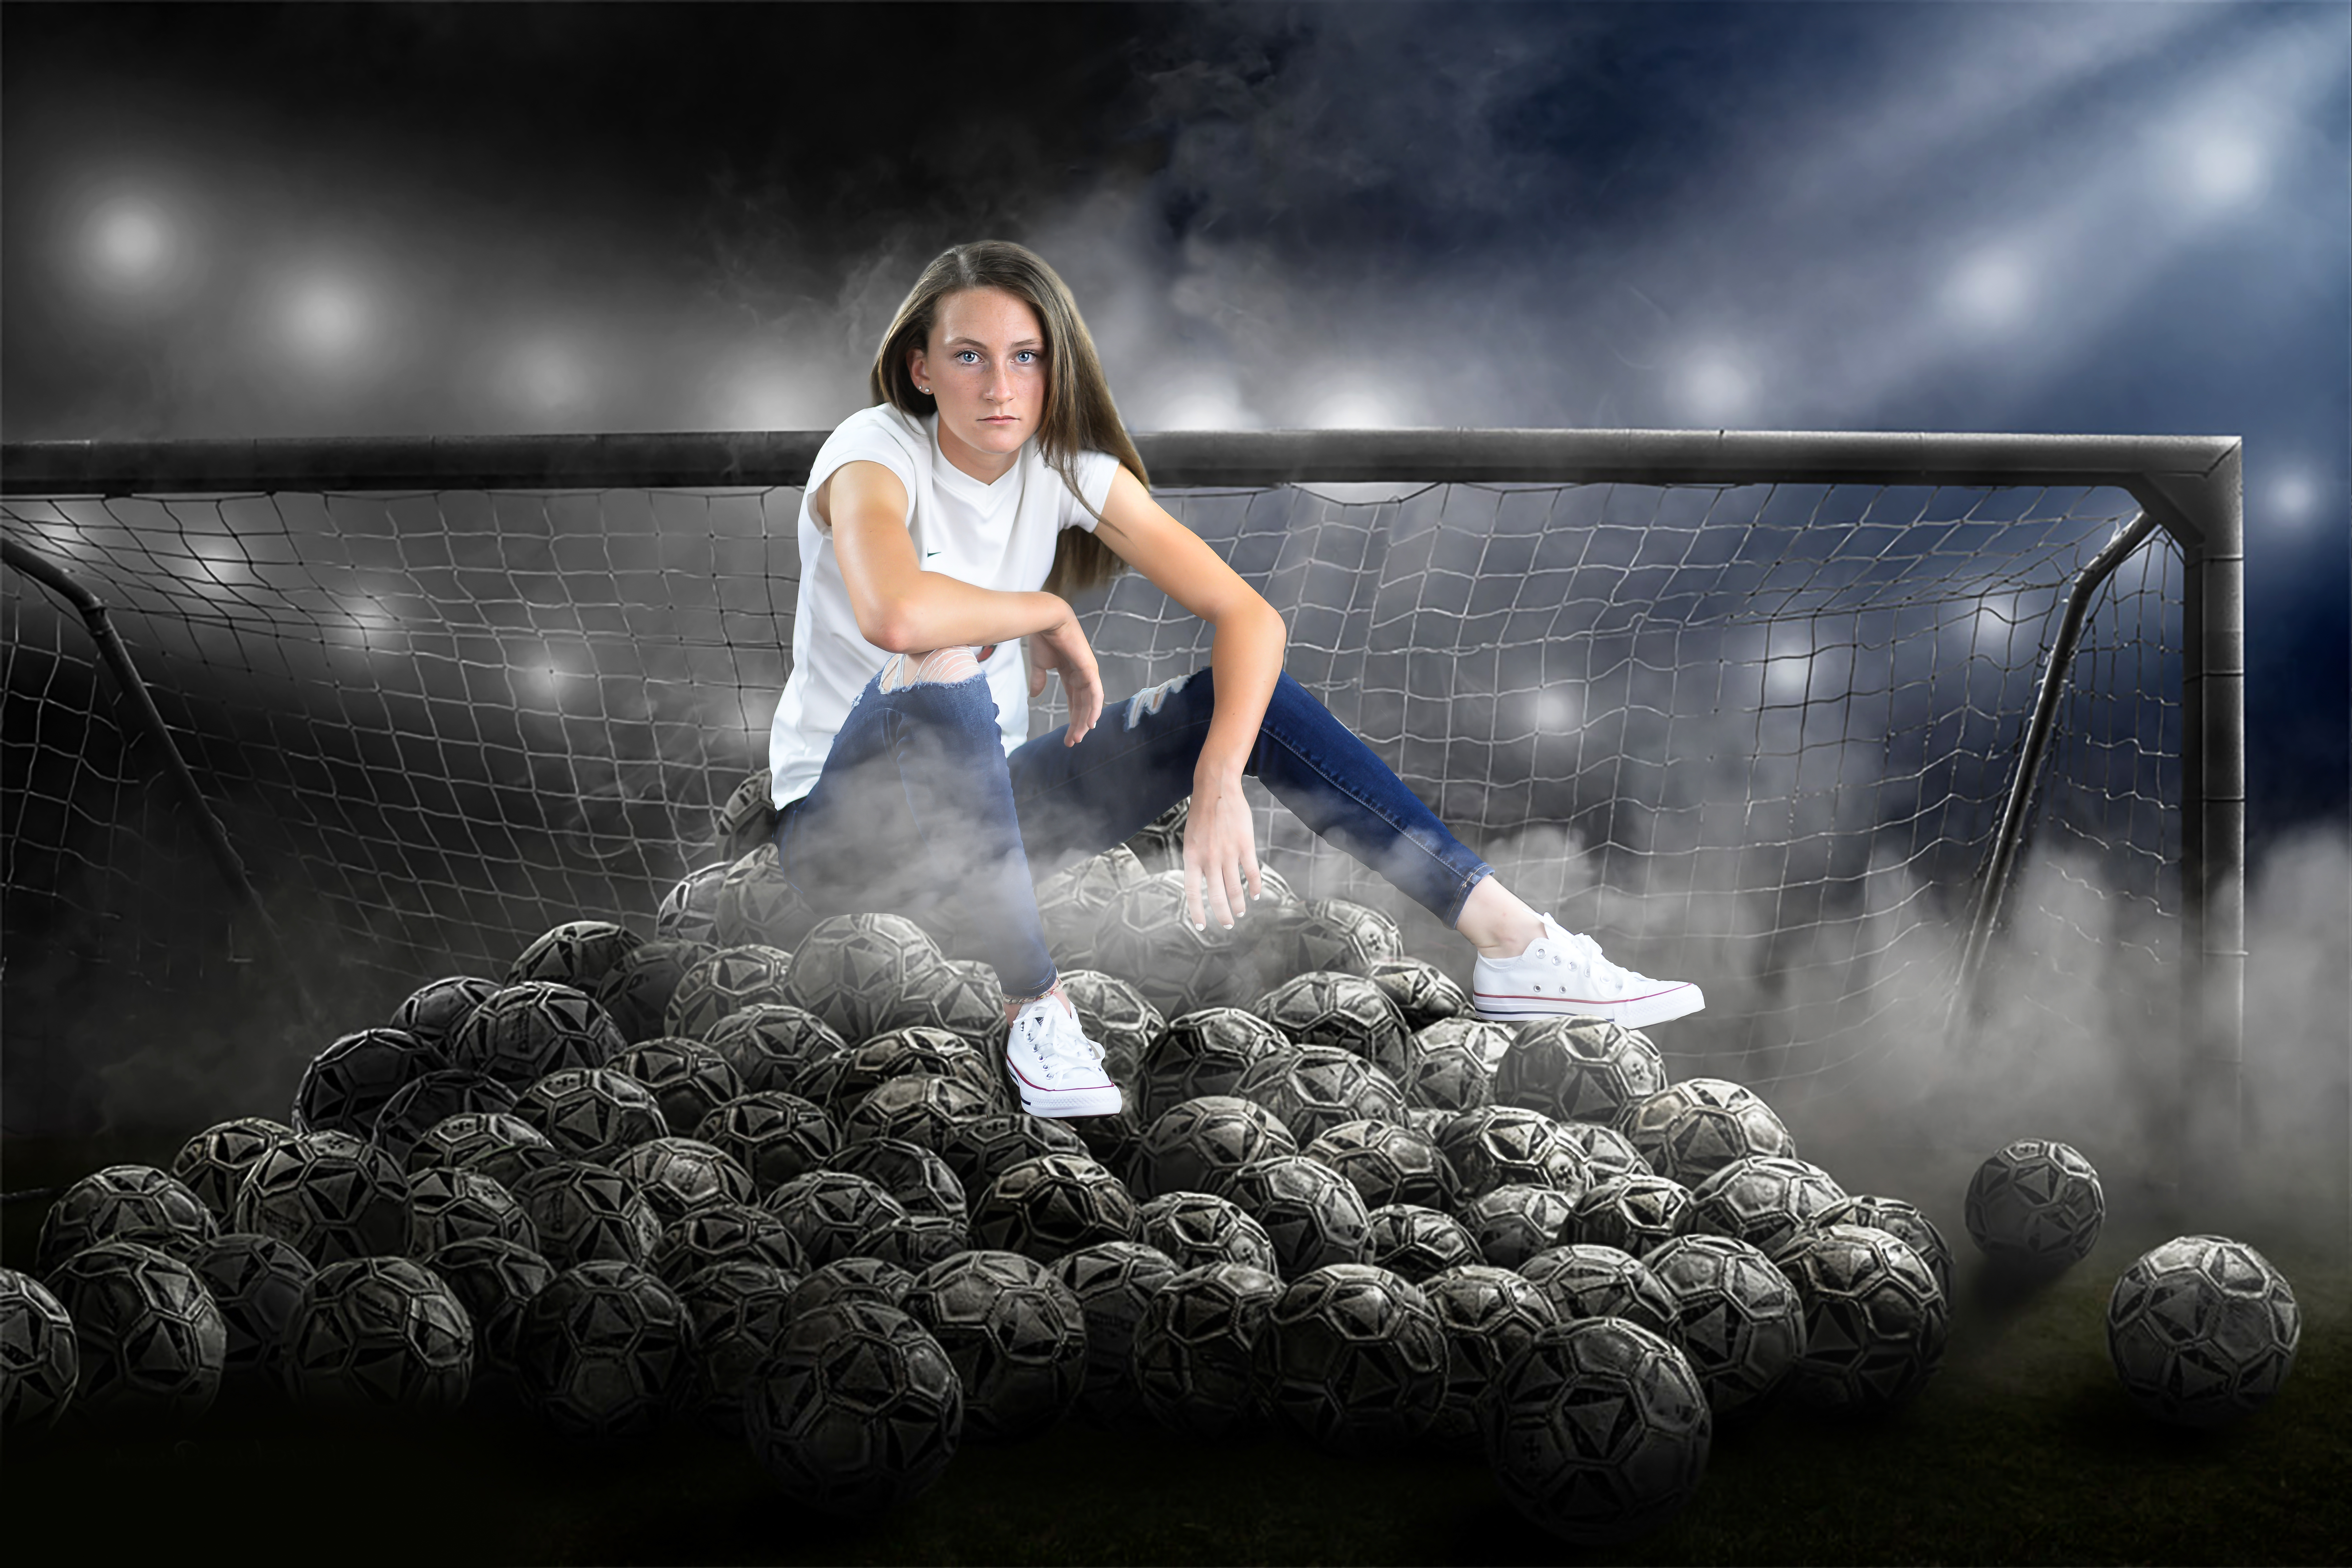 Payton soccer edit.1-1